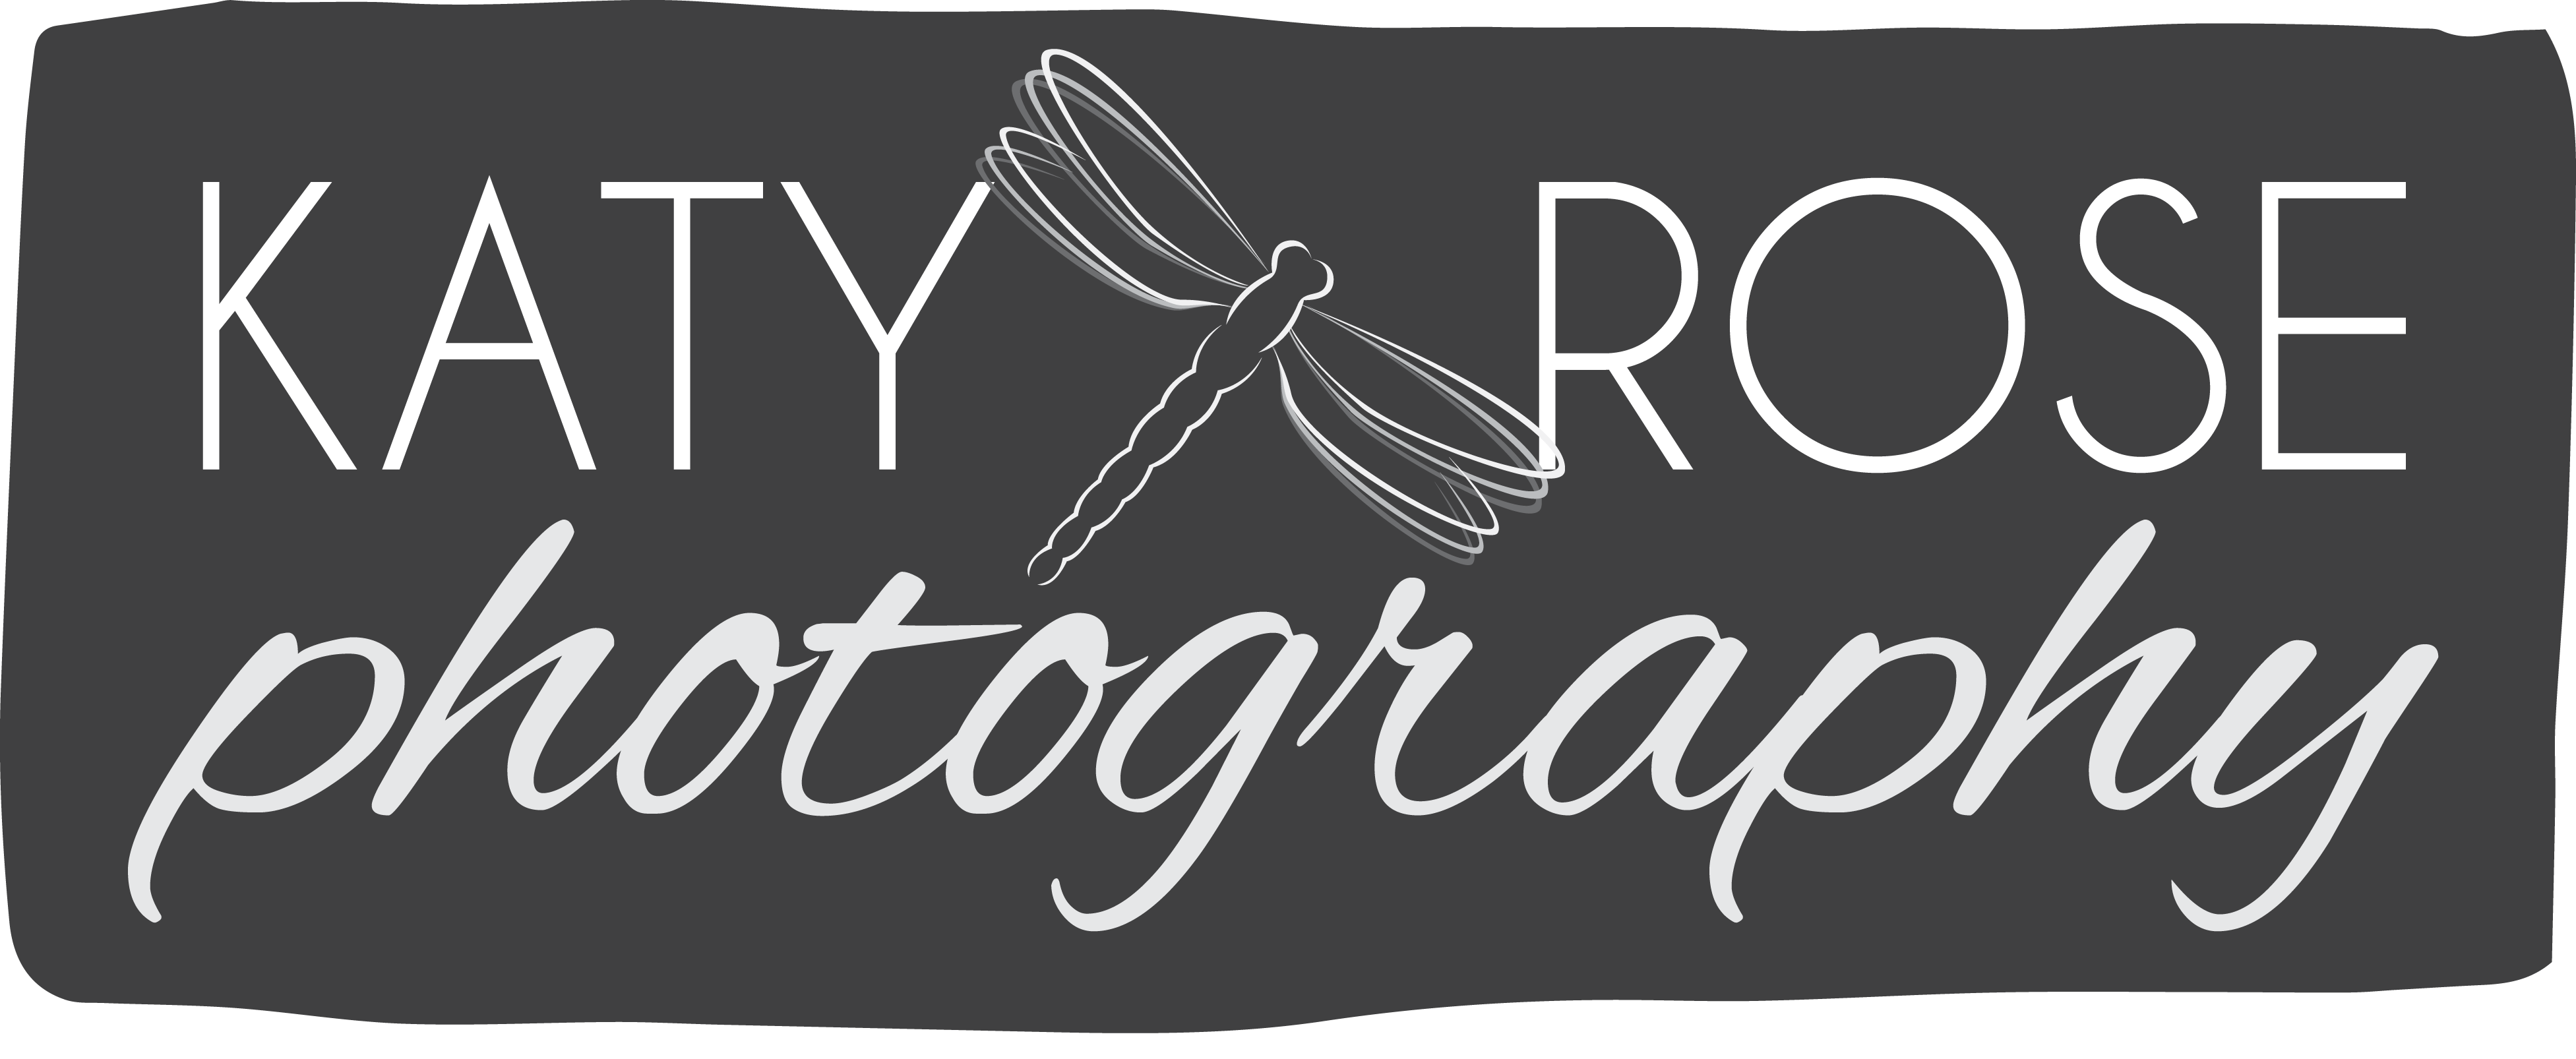 Katy Rose Photography